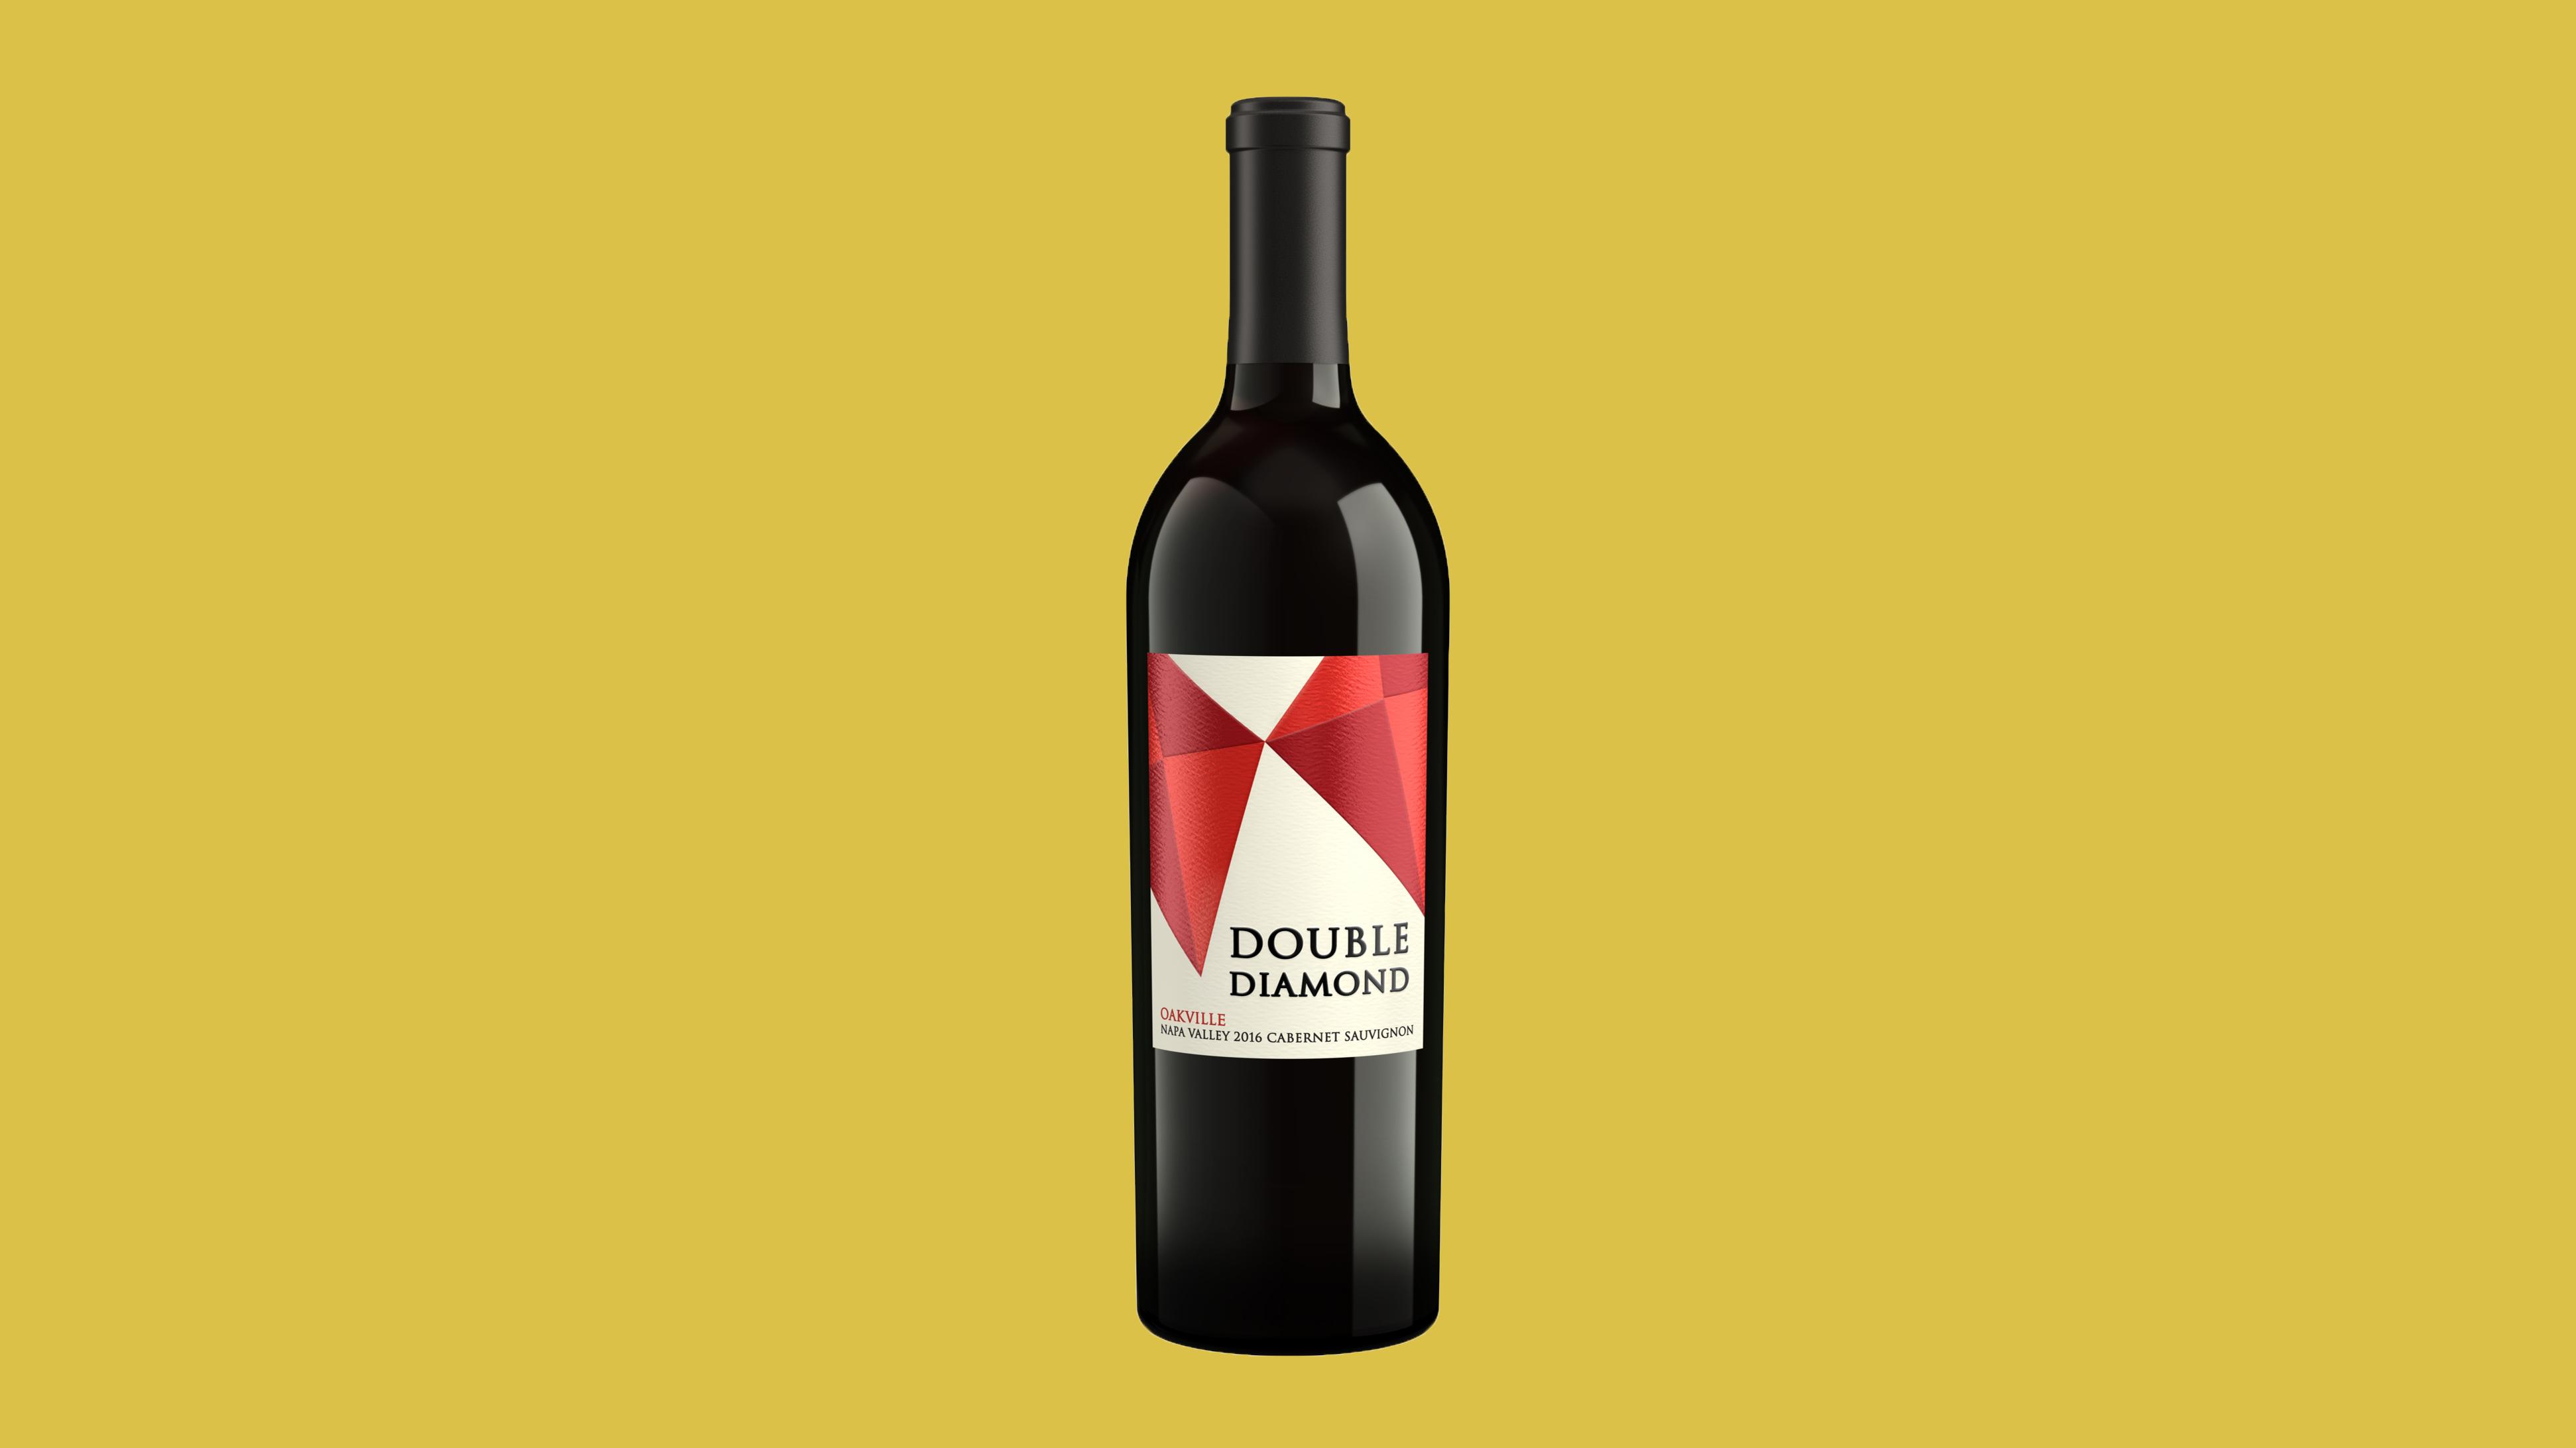 Double Diamond Oakville Cabernet Sauvignon 2016 wine